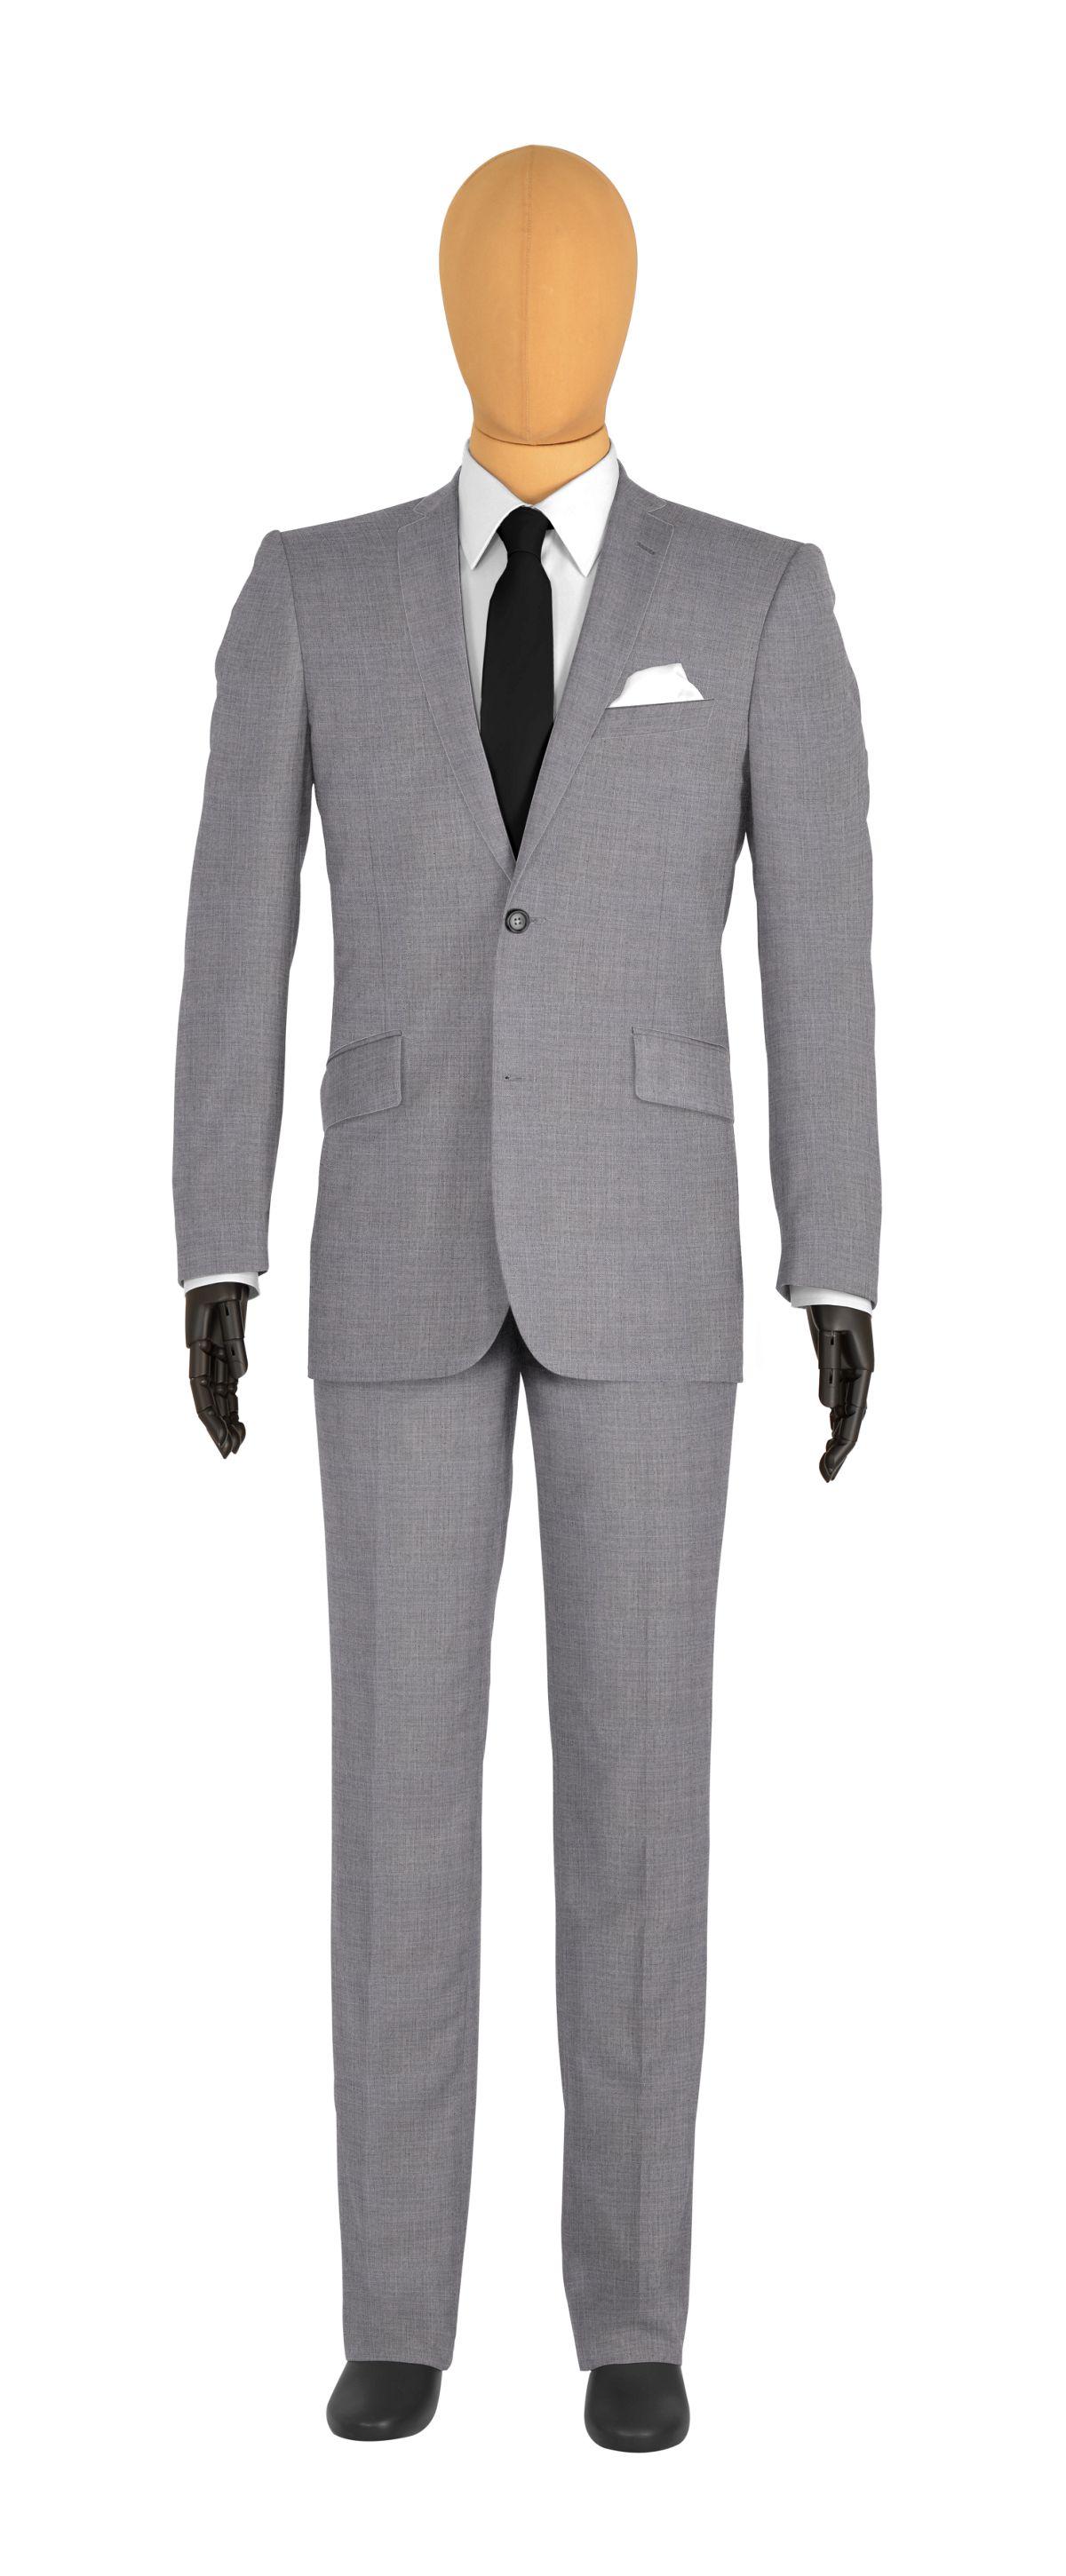 Costume sur mesure gris uni tailor corner - Costume homme gris clair ...